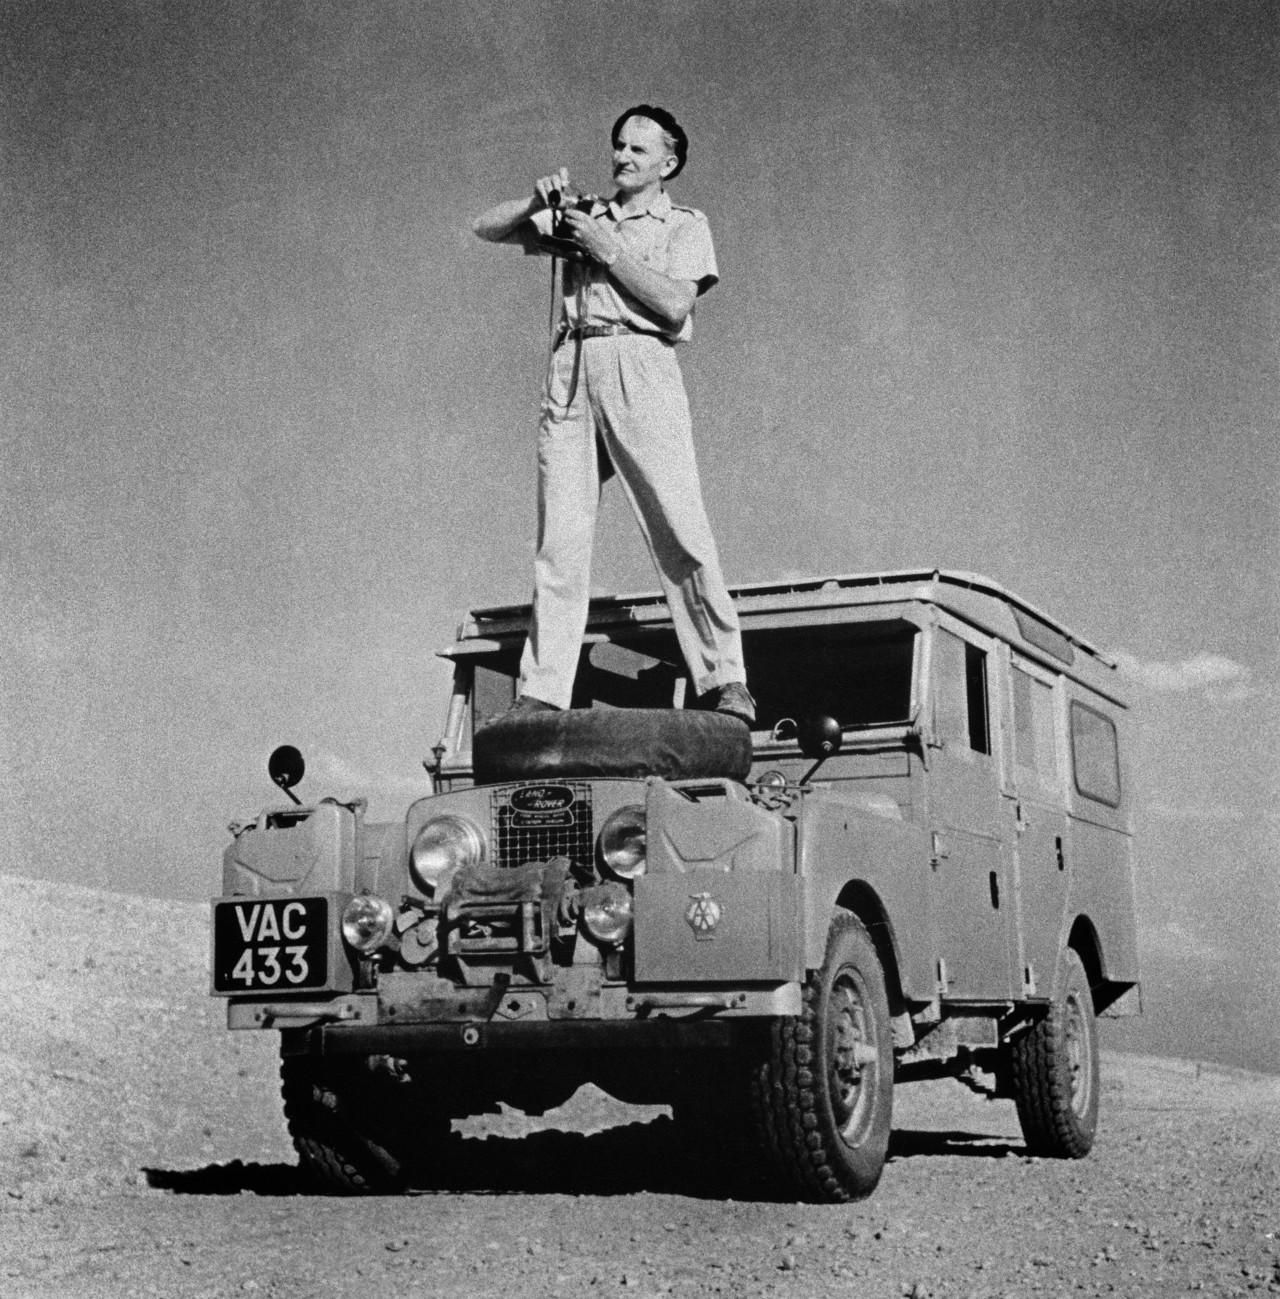 Africa. Algerian Sahara. 1957. George Rodger.